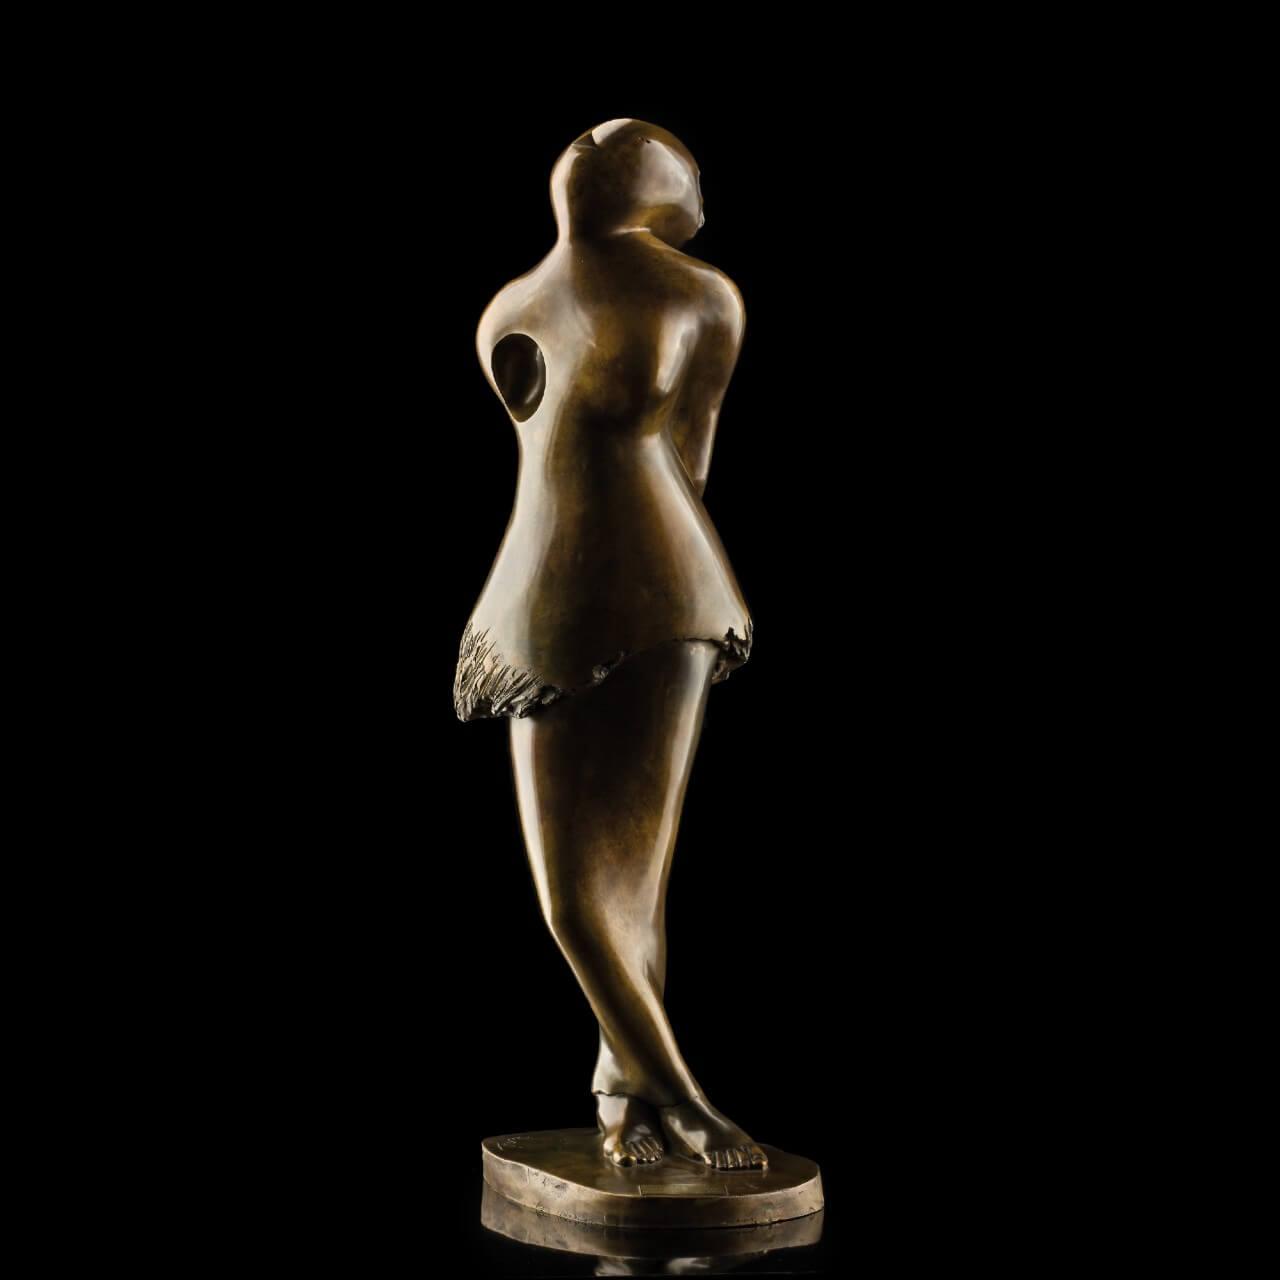 mario pavesi italian sculptur painter bronze female figure dancer